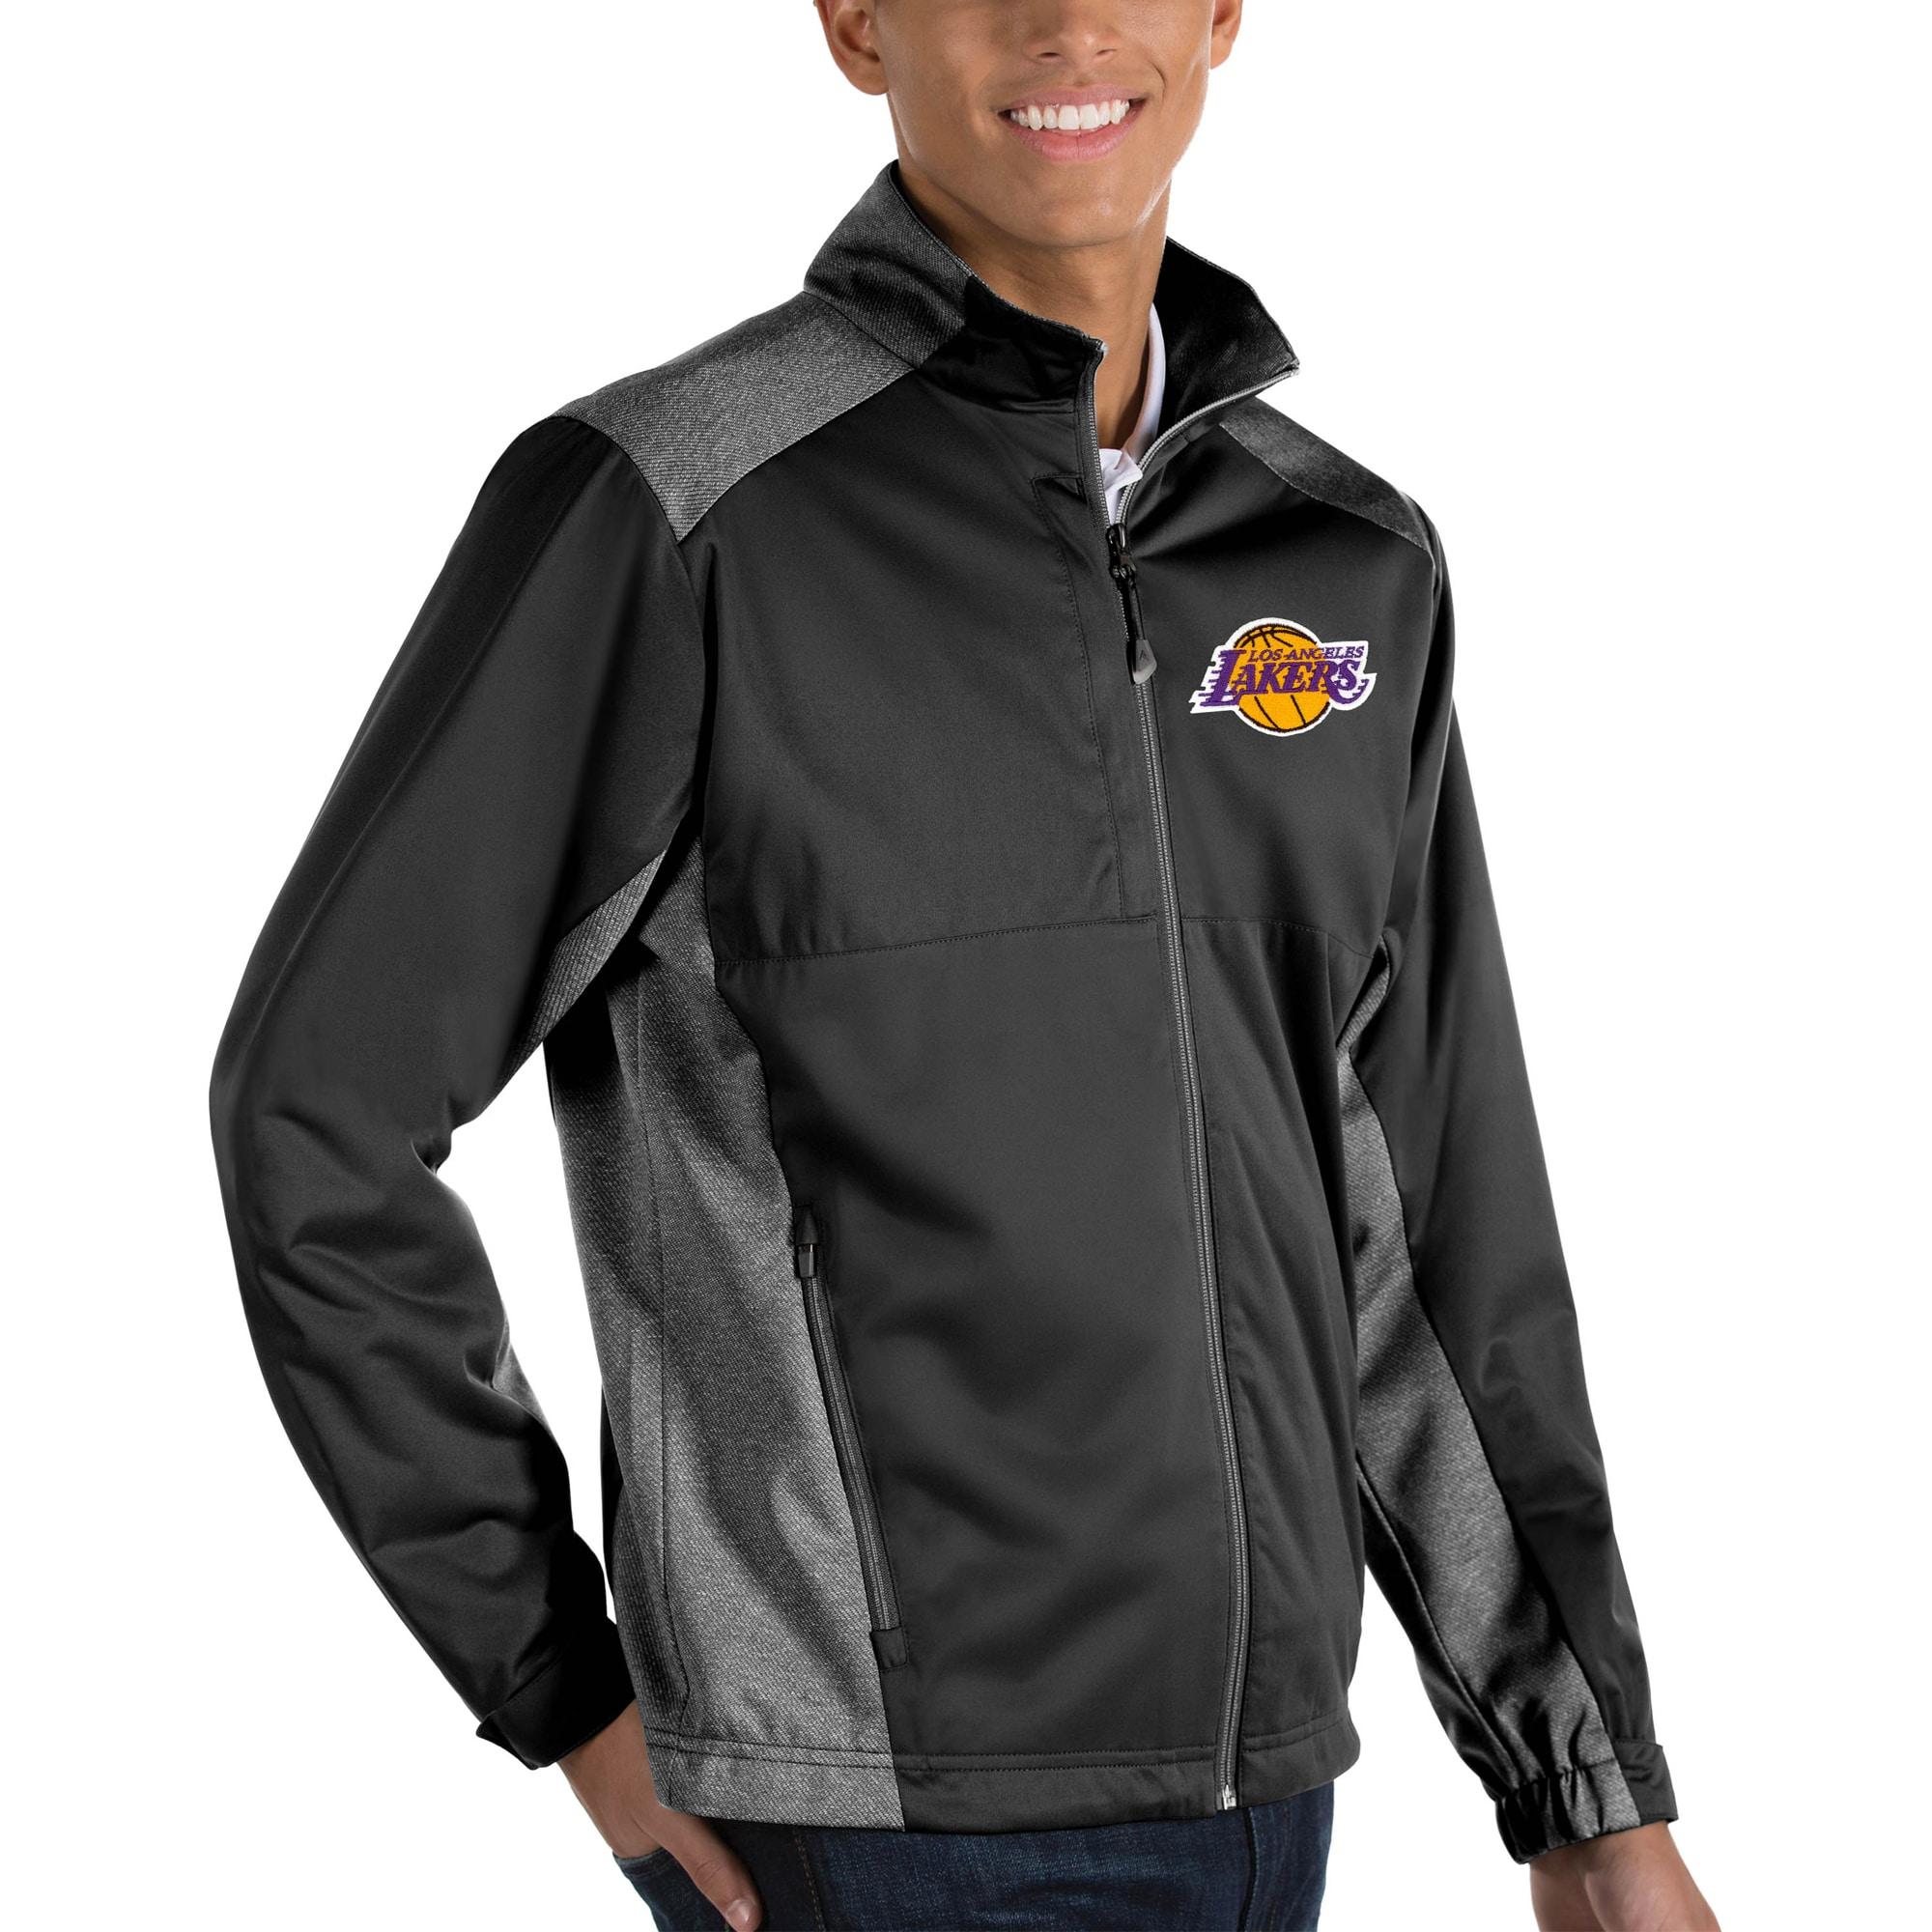 Los Angeles Lakers Antigua Revolve Big & Tall Full-Zip Jacket - Black